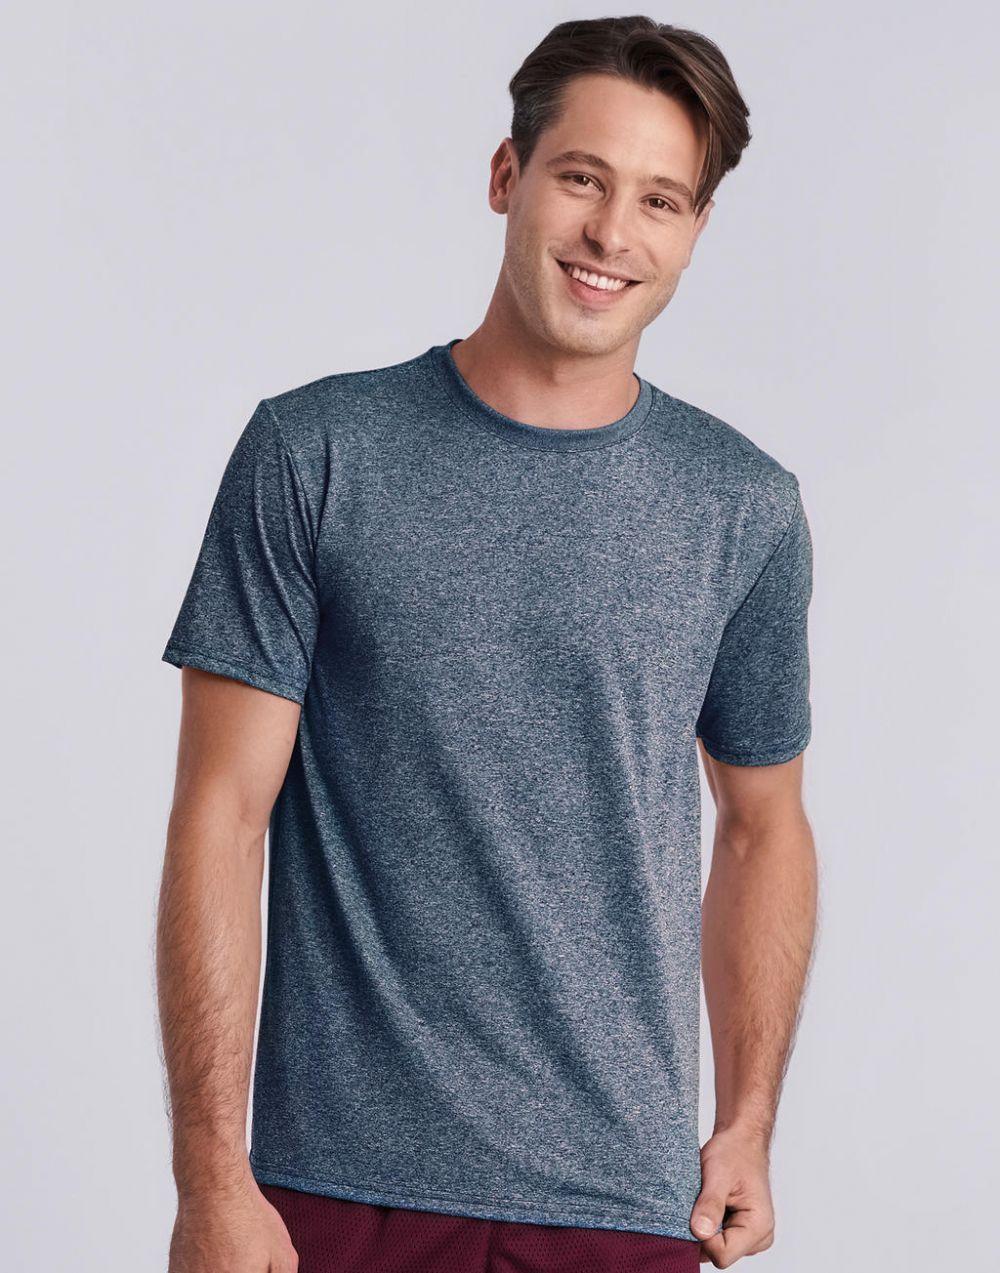 Camisetas técnicas gildan performance core hombre vista 1